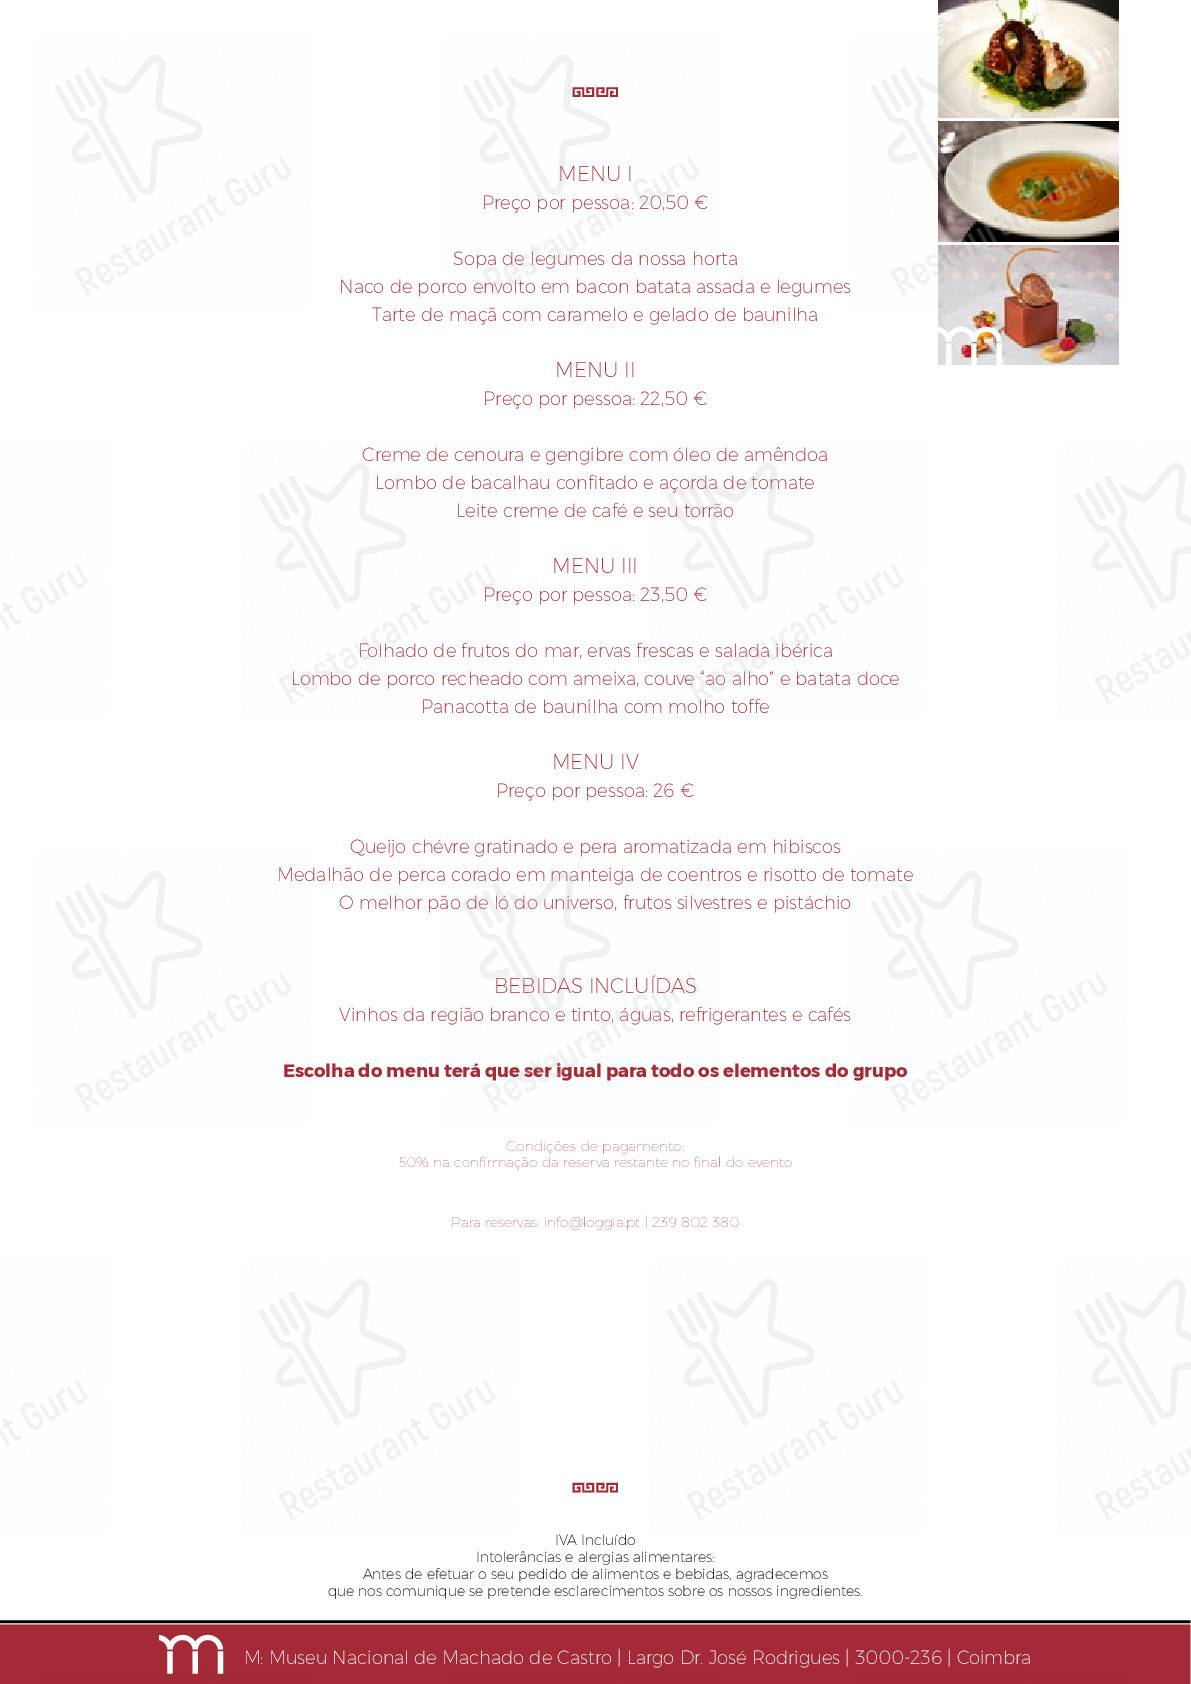 Loggia menu